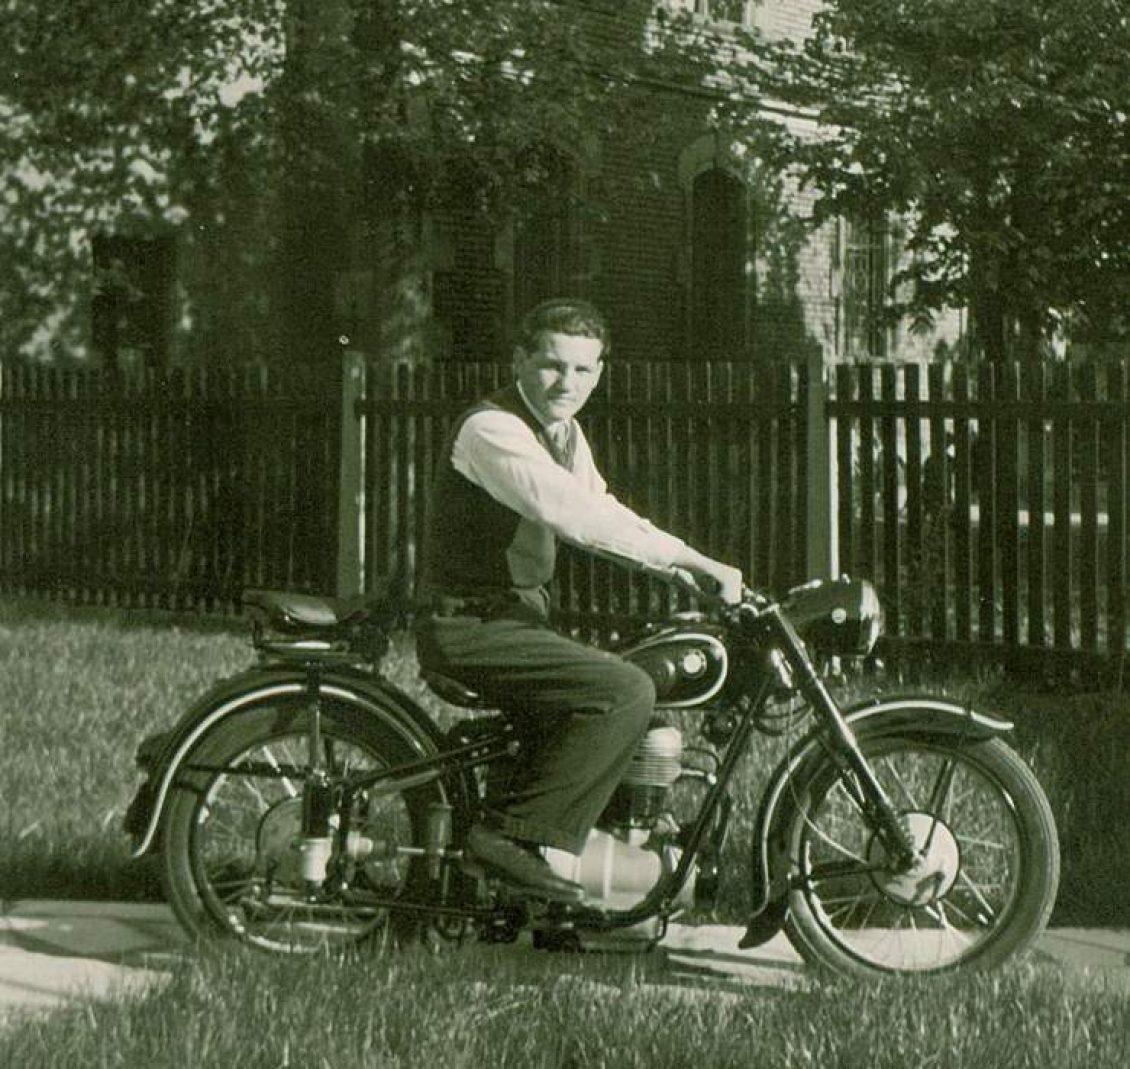 Kissil 1951